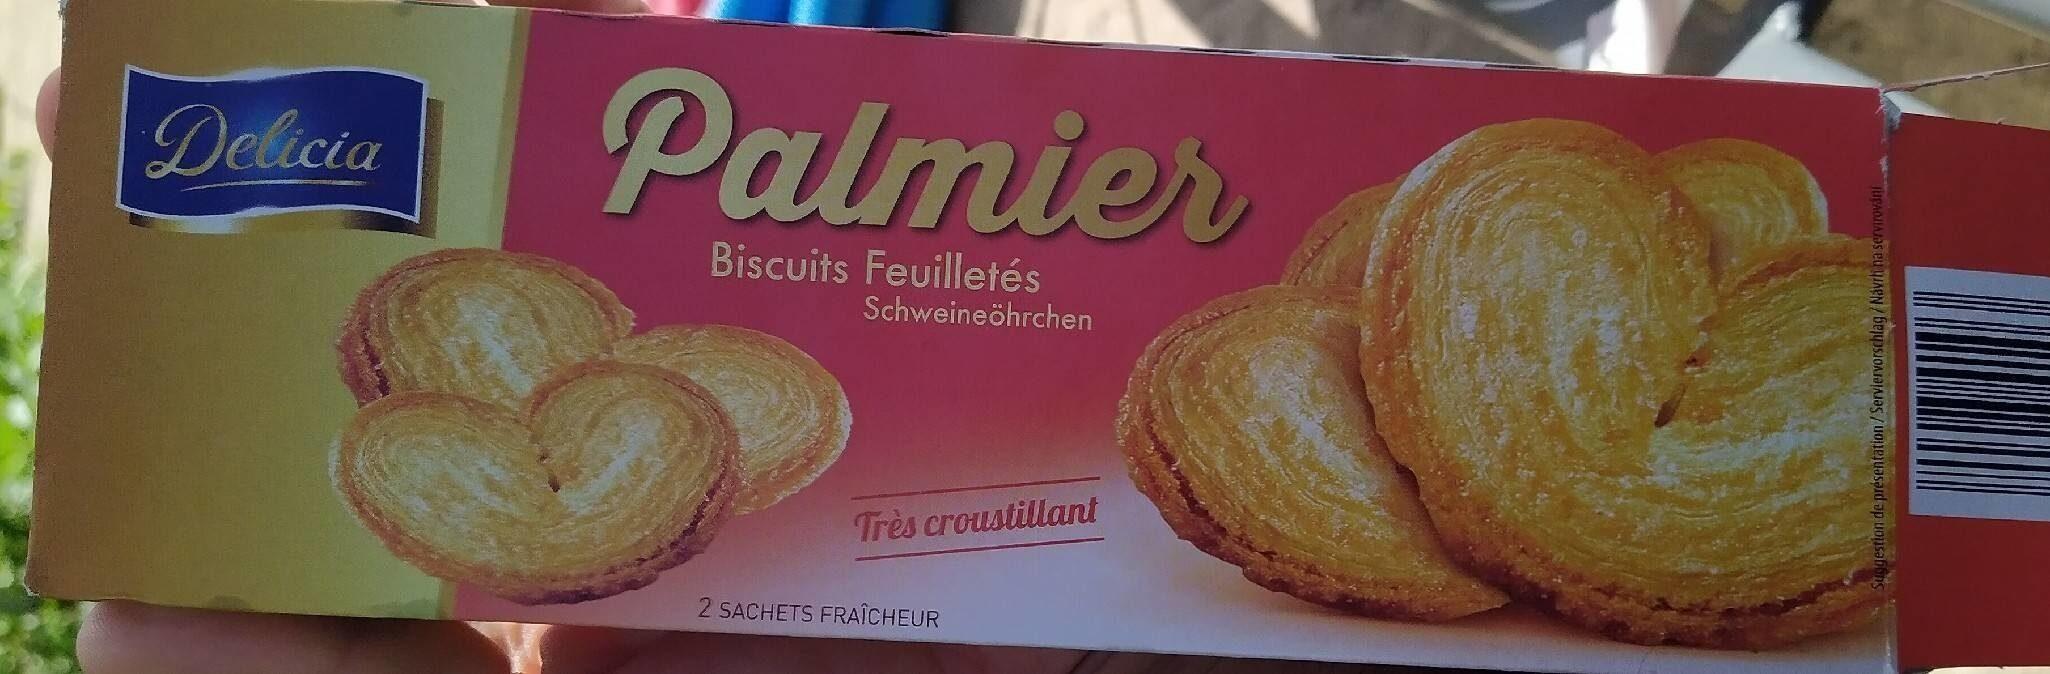 Palmier - Product - fr